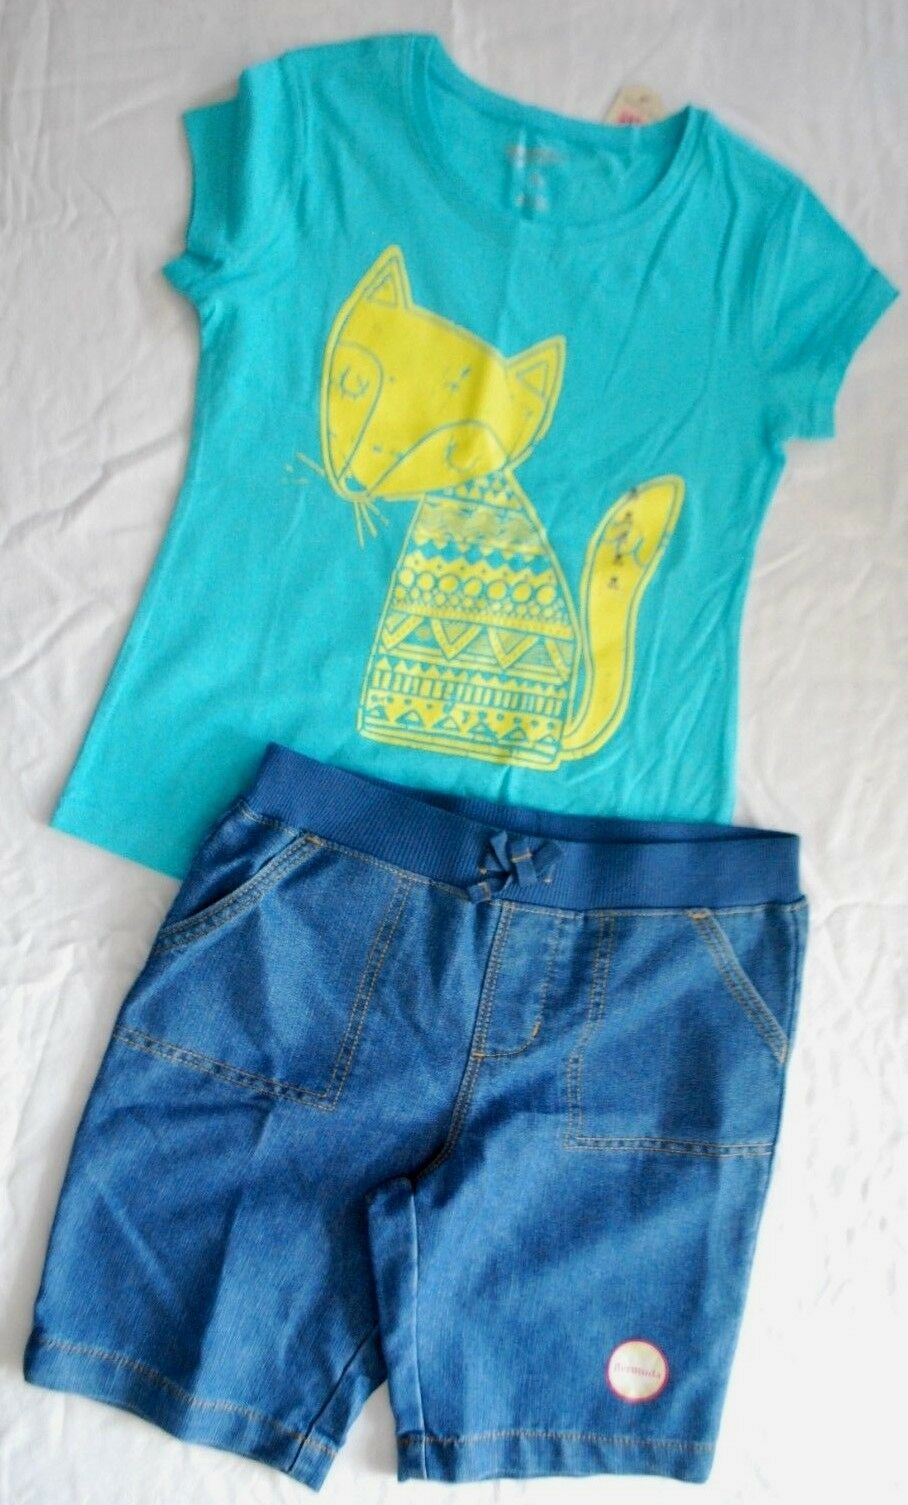 GIRLS SIZE 10 12 FOX TOP & BERMUDA SHORT CLOTHING SET - NEW